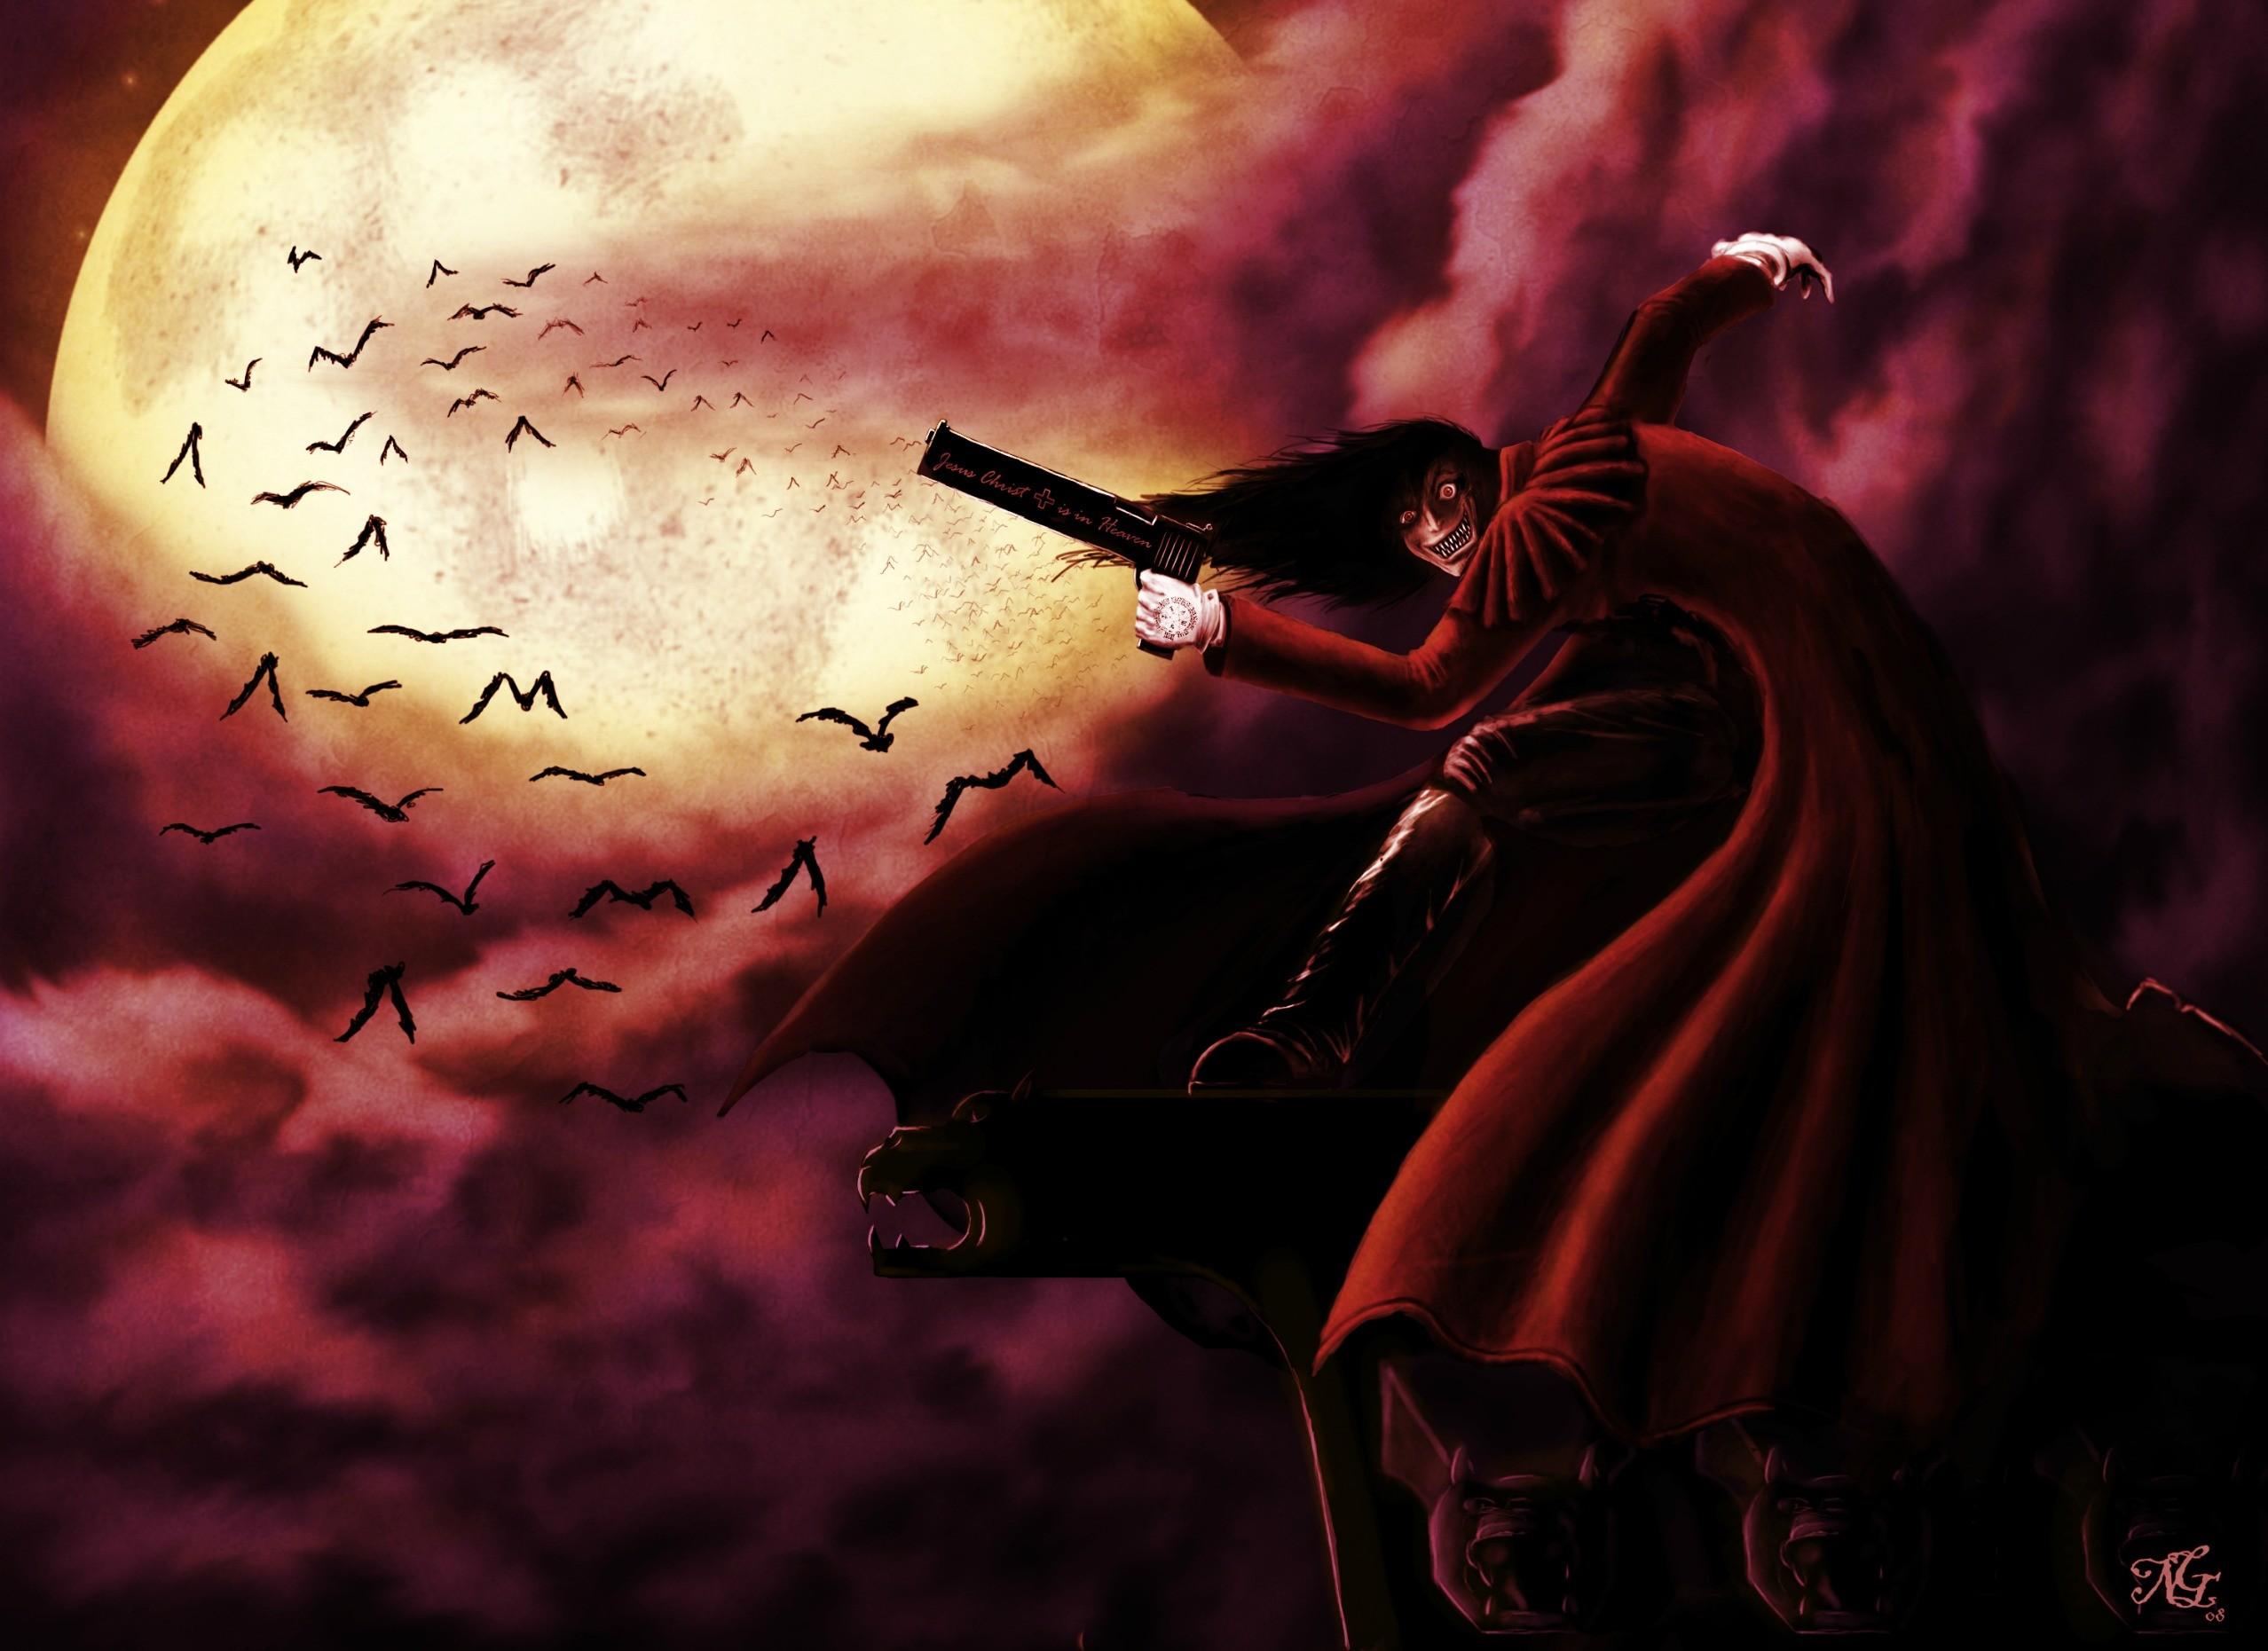 Hellsing Ultimate, Alucard, I belong to the night.